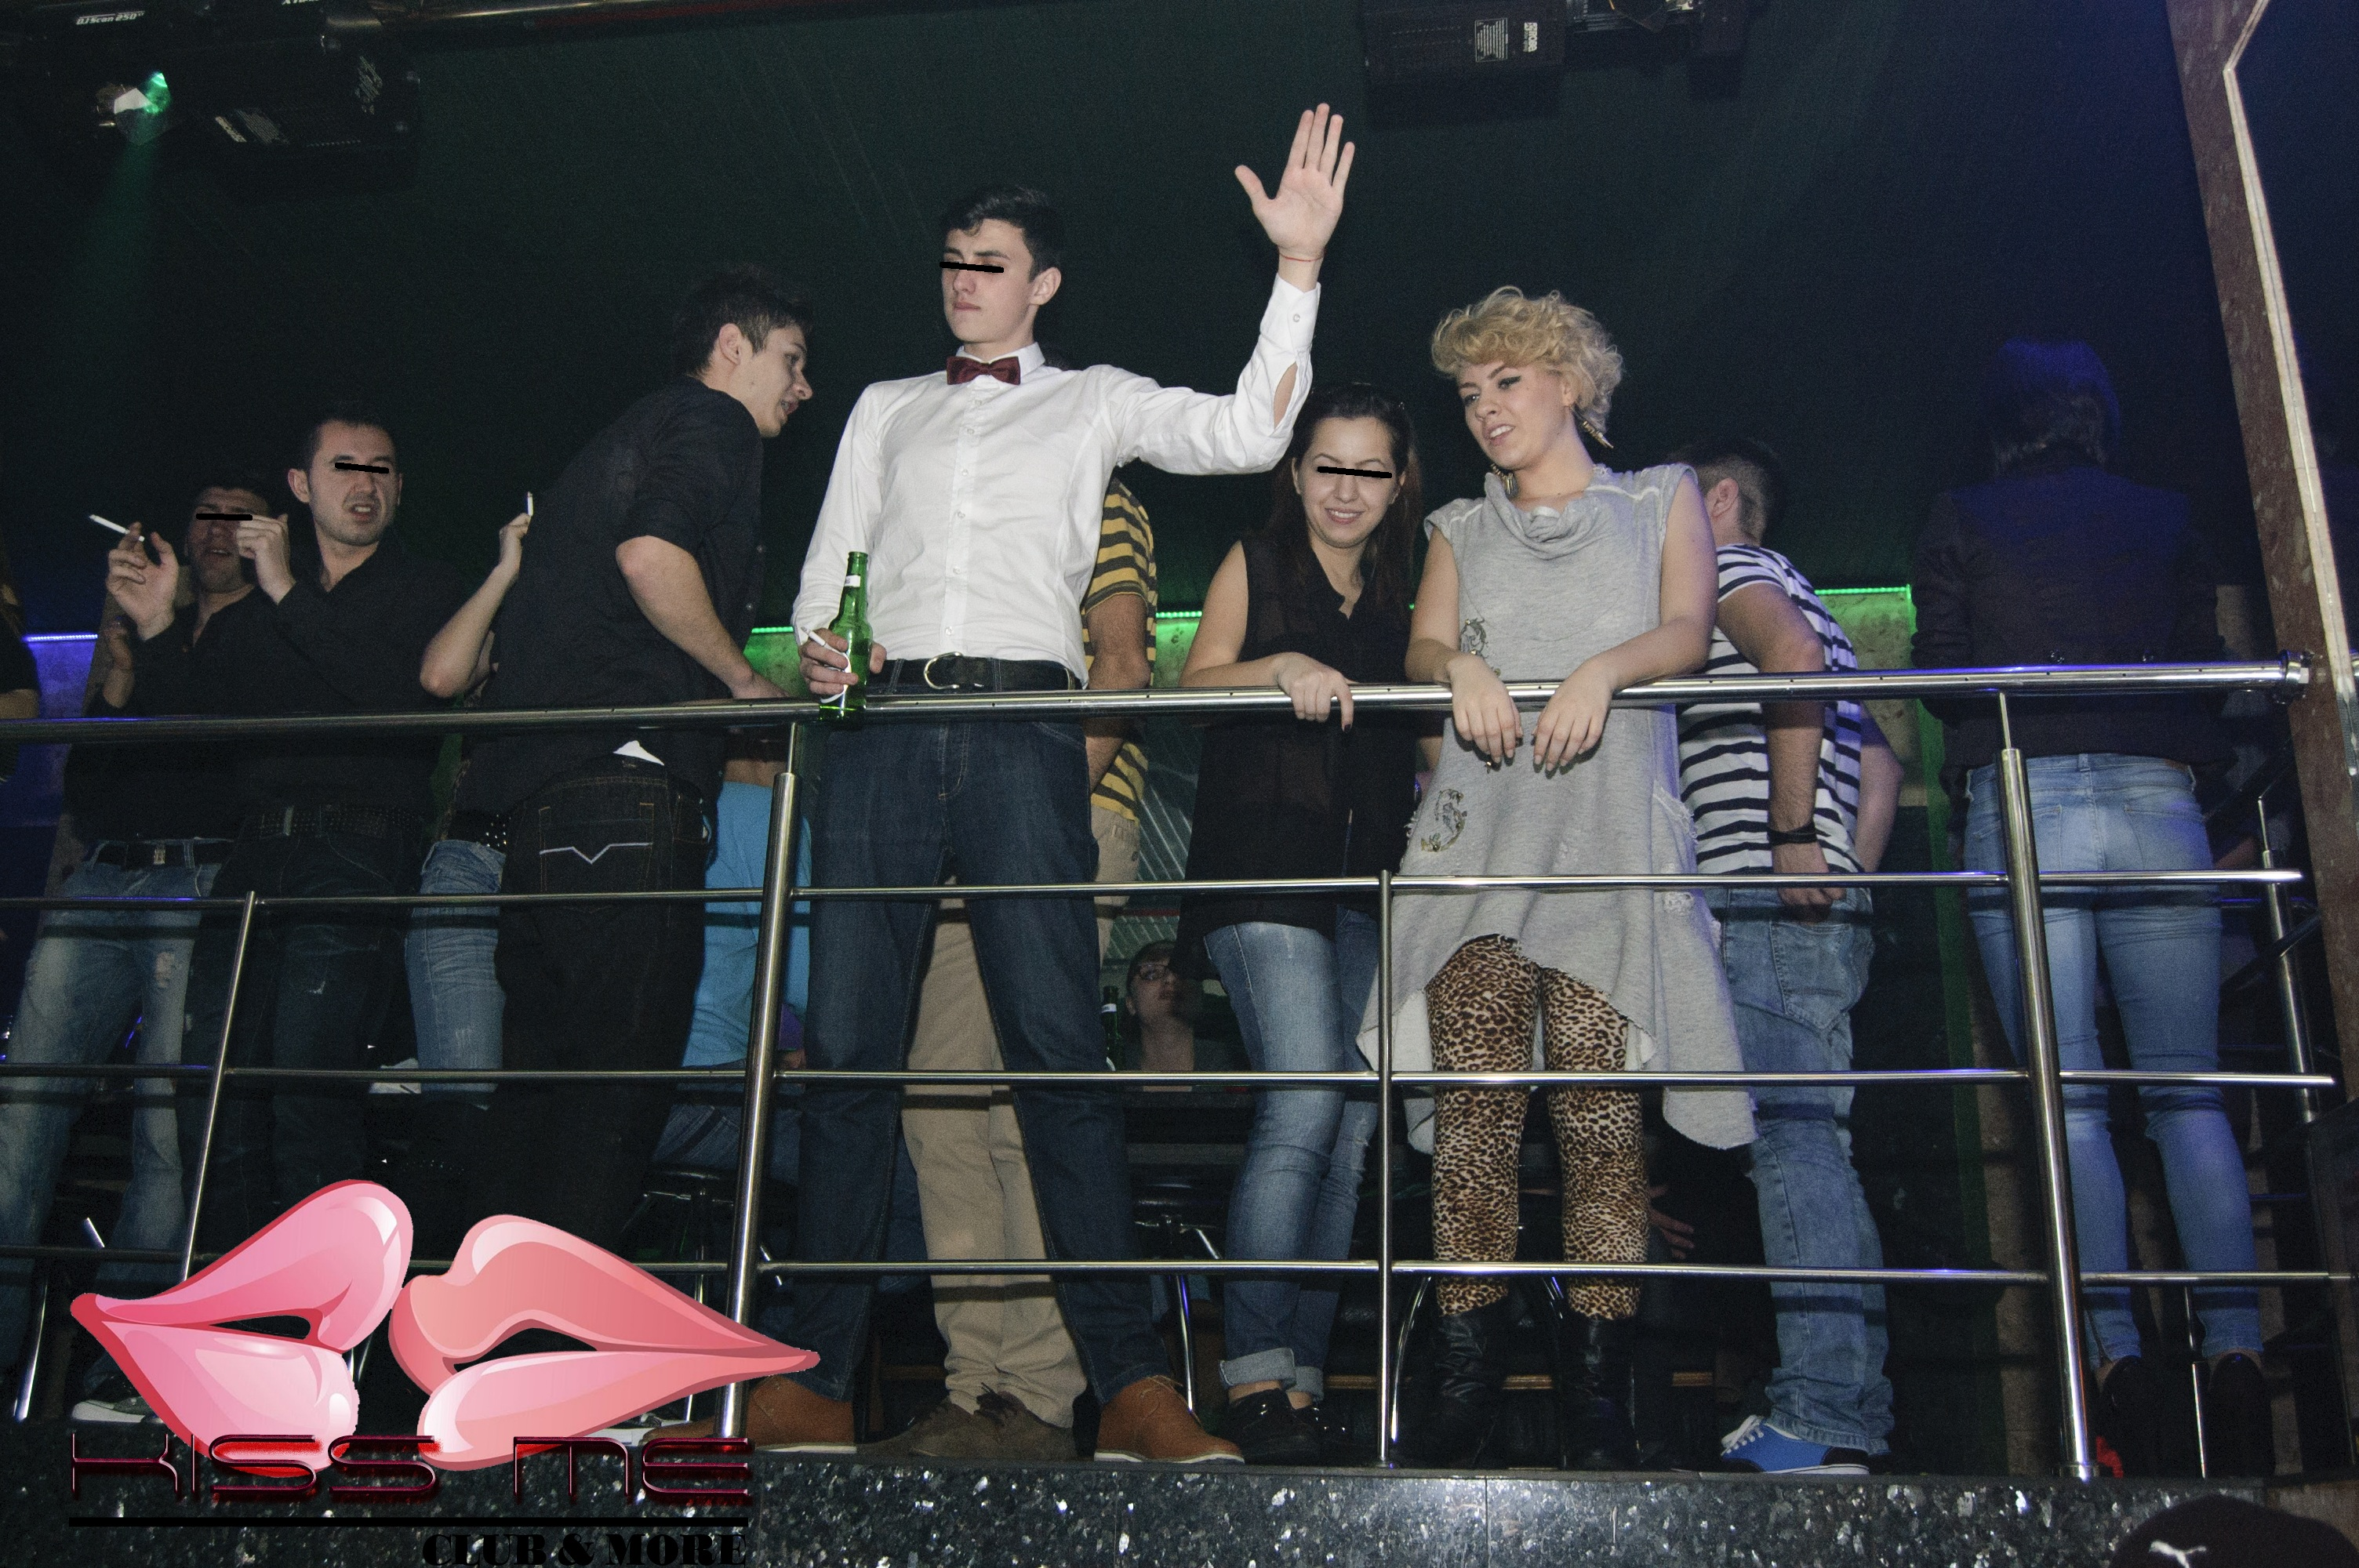 Ioana s-a distrat toata noaptea in club, dar n-a vrut sa plateasca nota